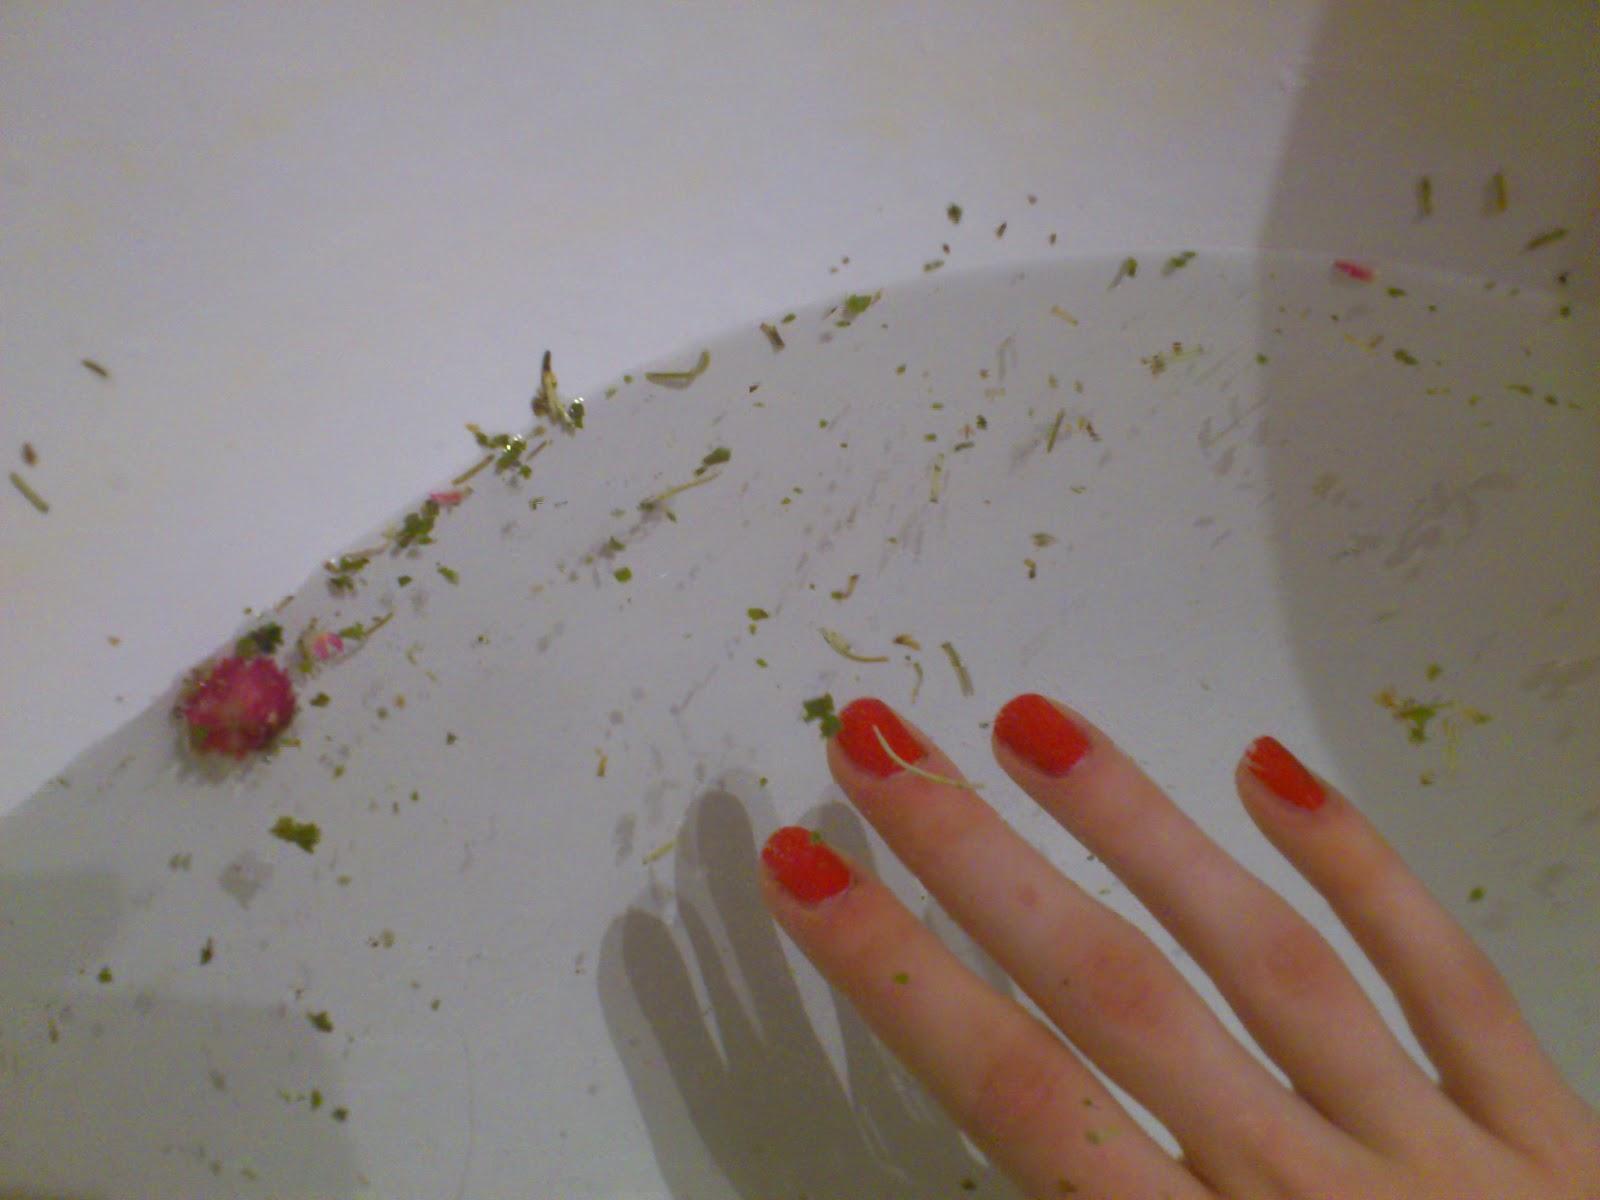 Valeria chaos sopa de flores primaveral - Bombas de bano mercadona ...